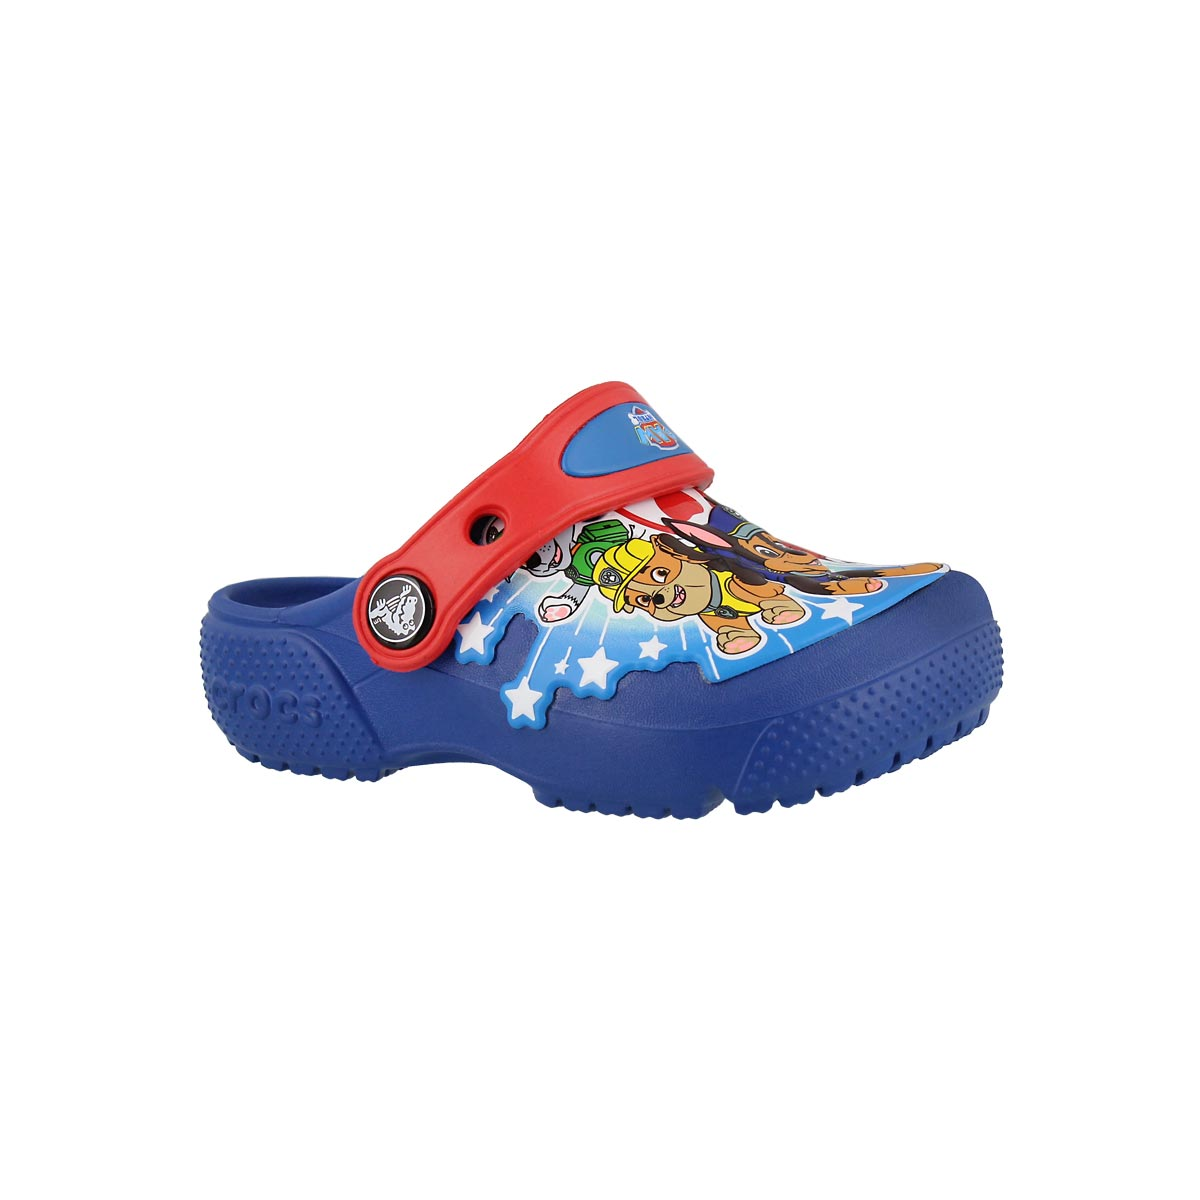 Kids' FUNLAB PAW PATROL blue jean clogs